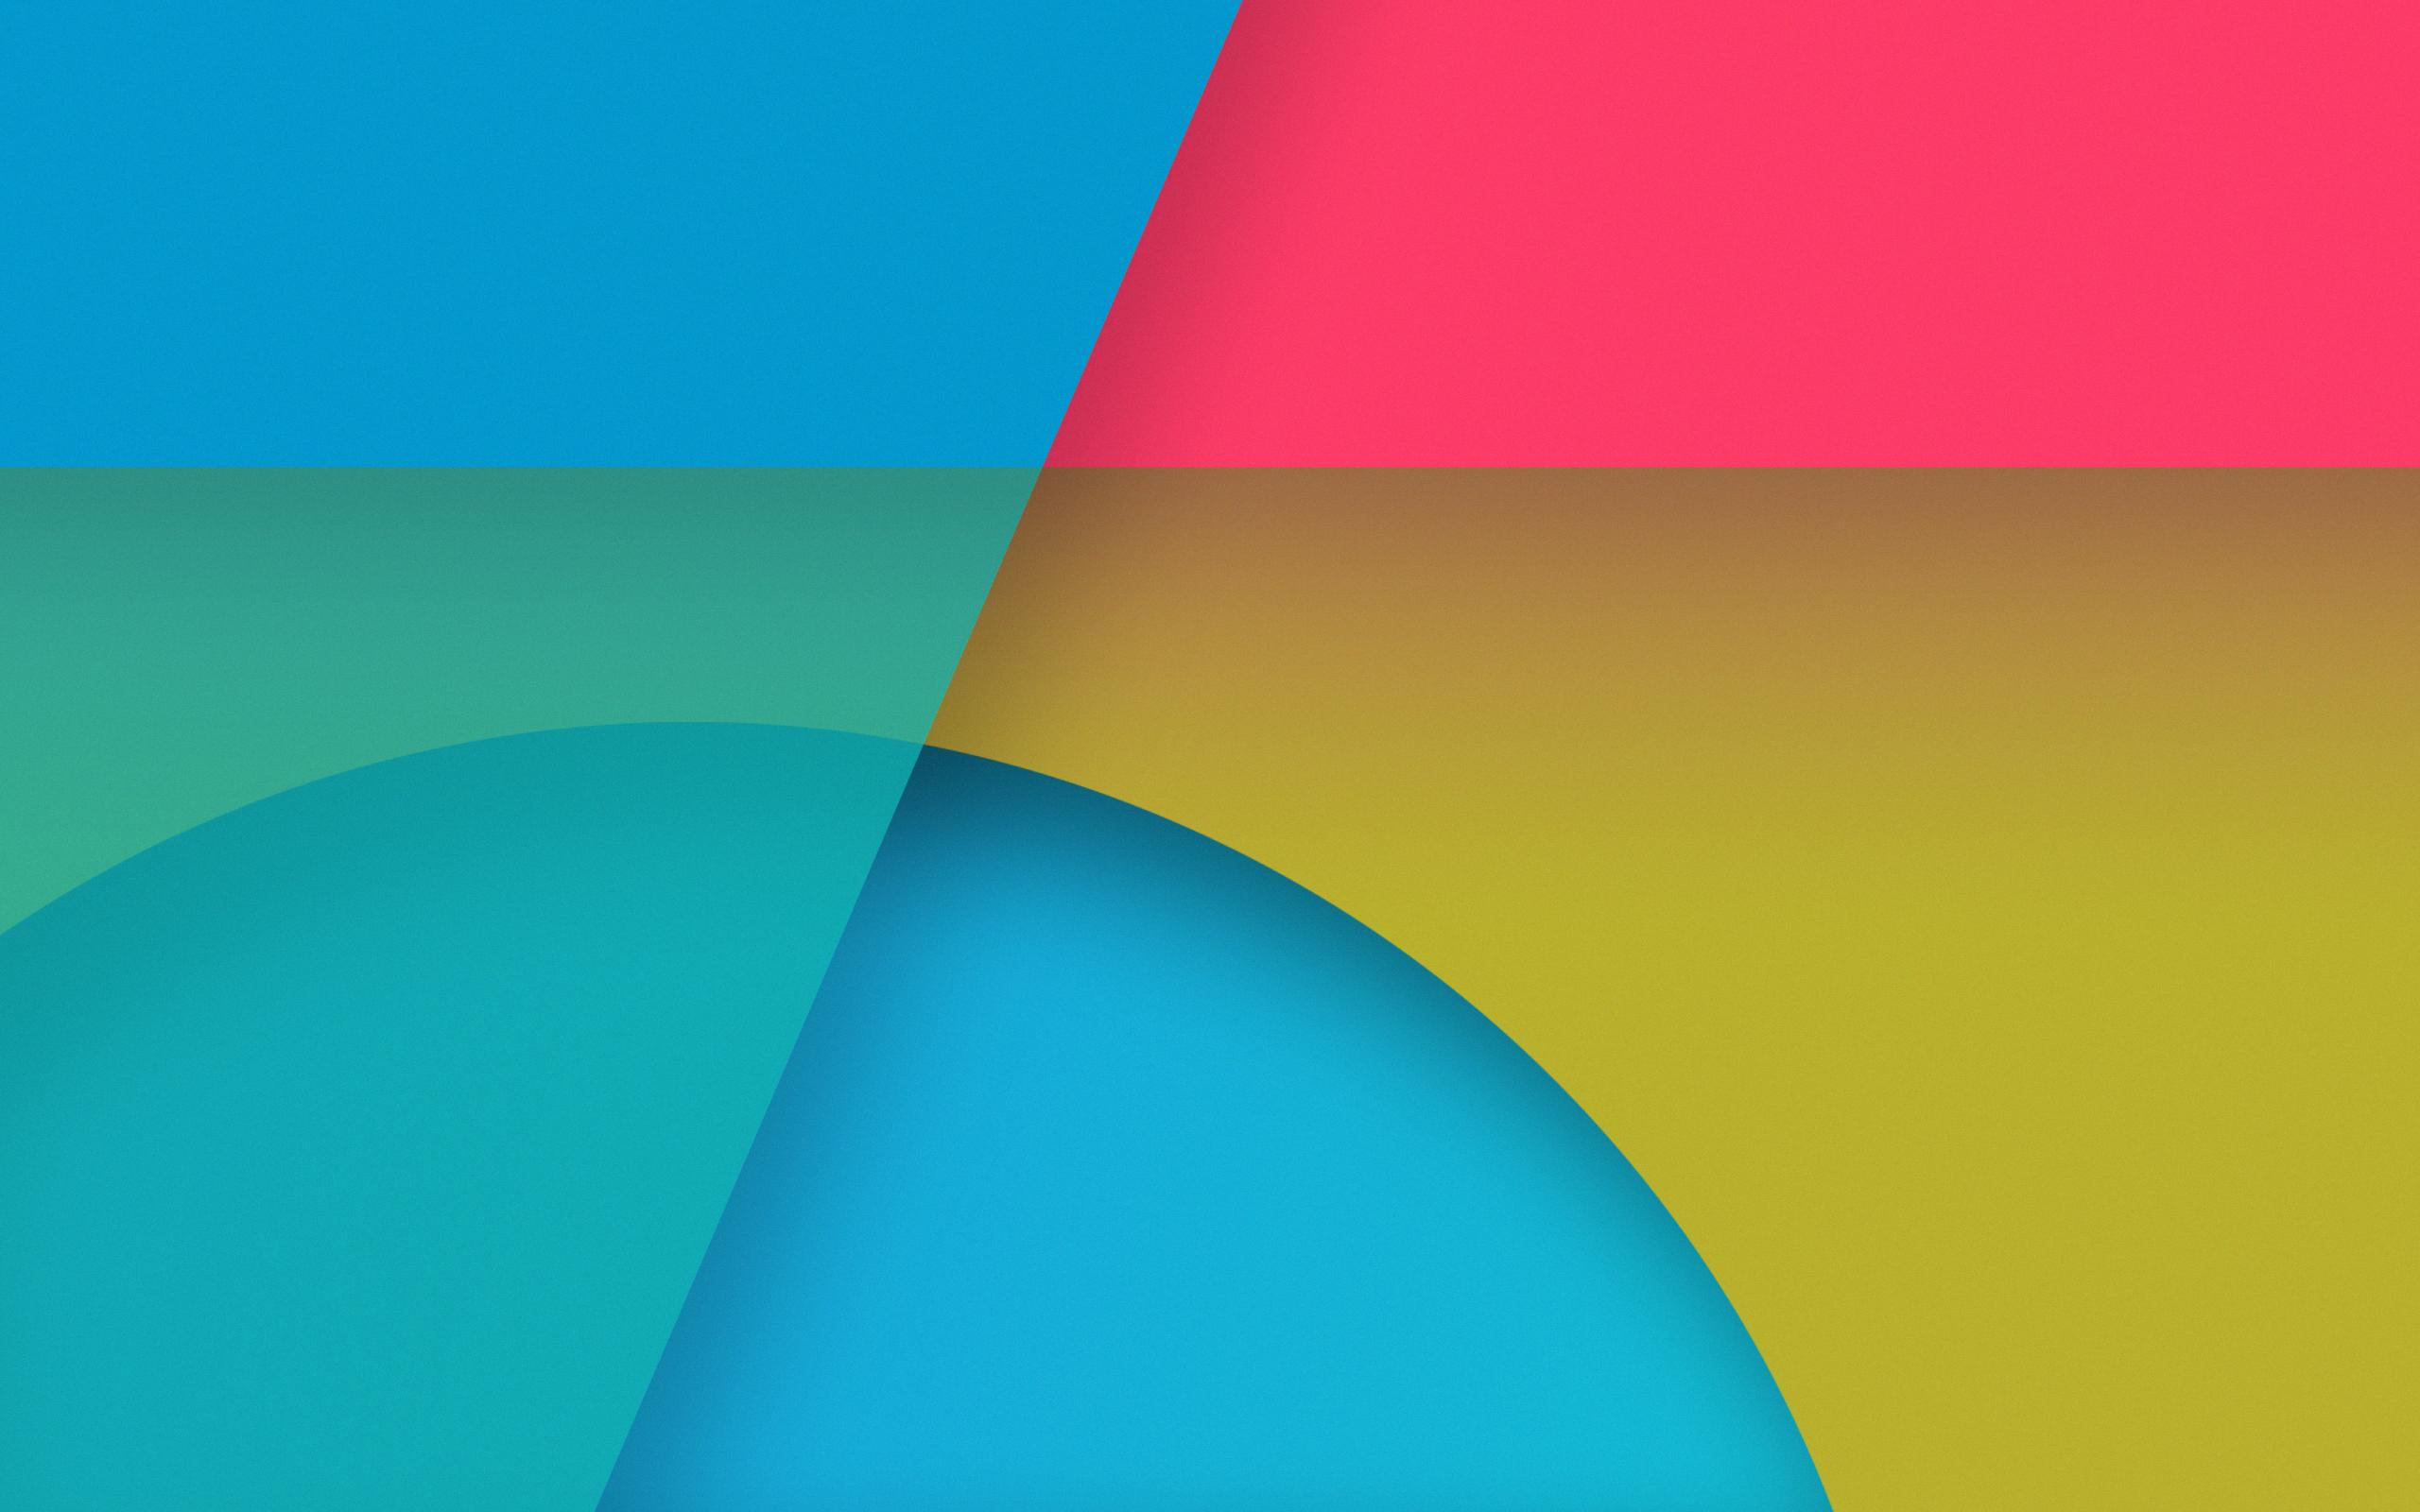 Download nexus 5 android 44 kitkat stock background wallpapers nexus 5 background wallpaper voltagebd Images